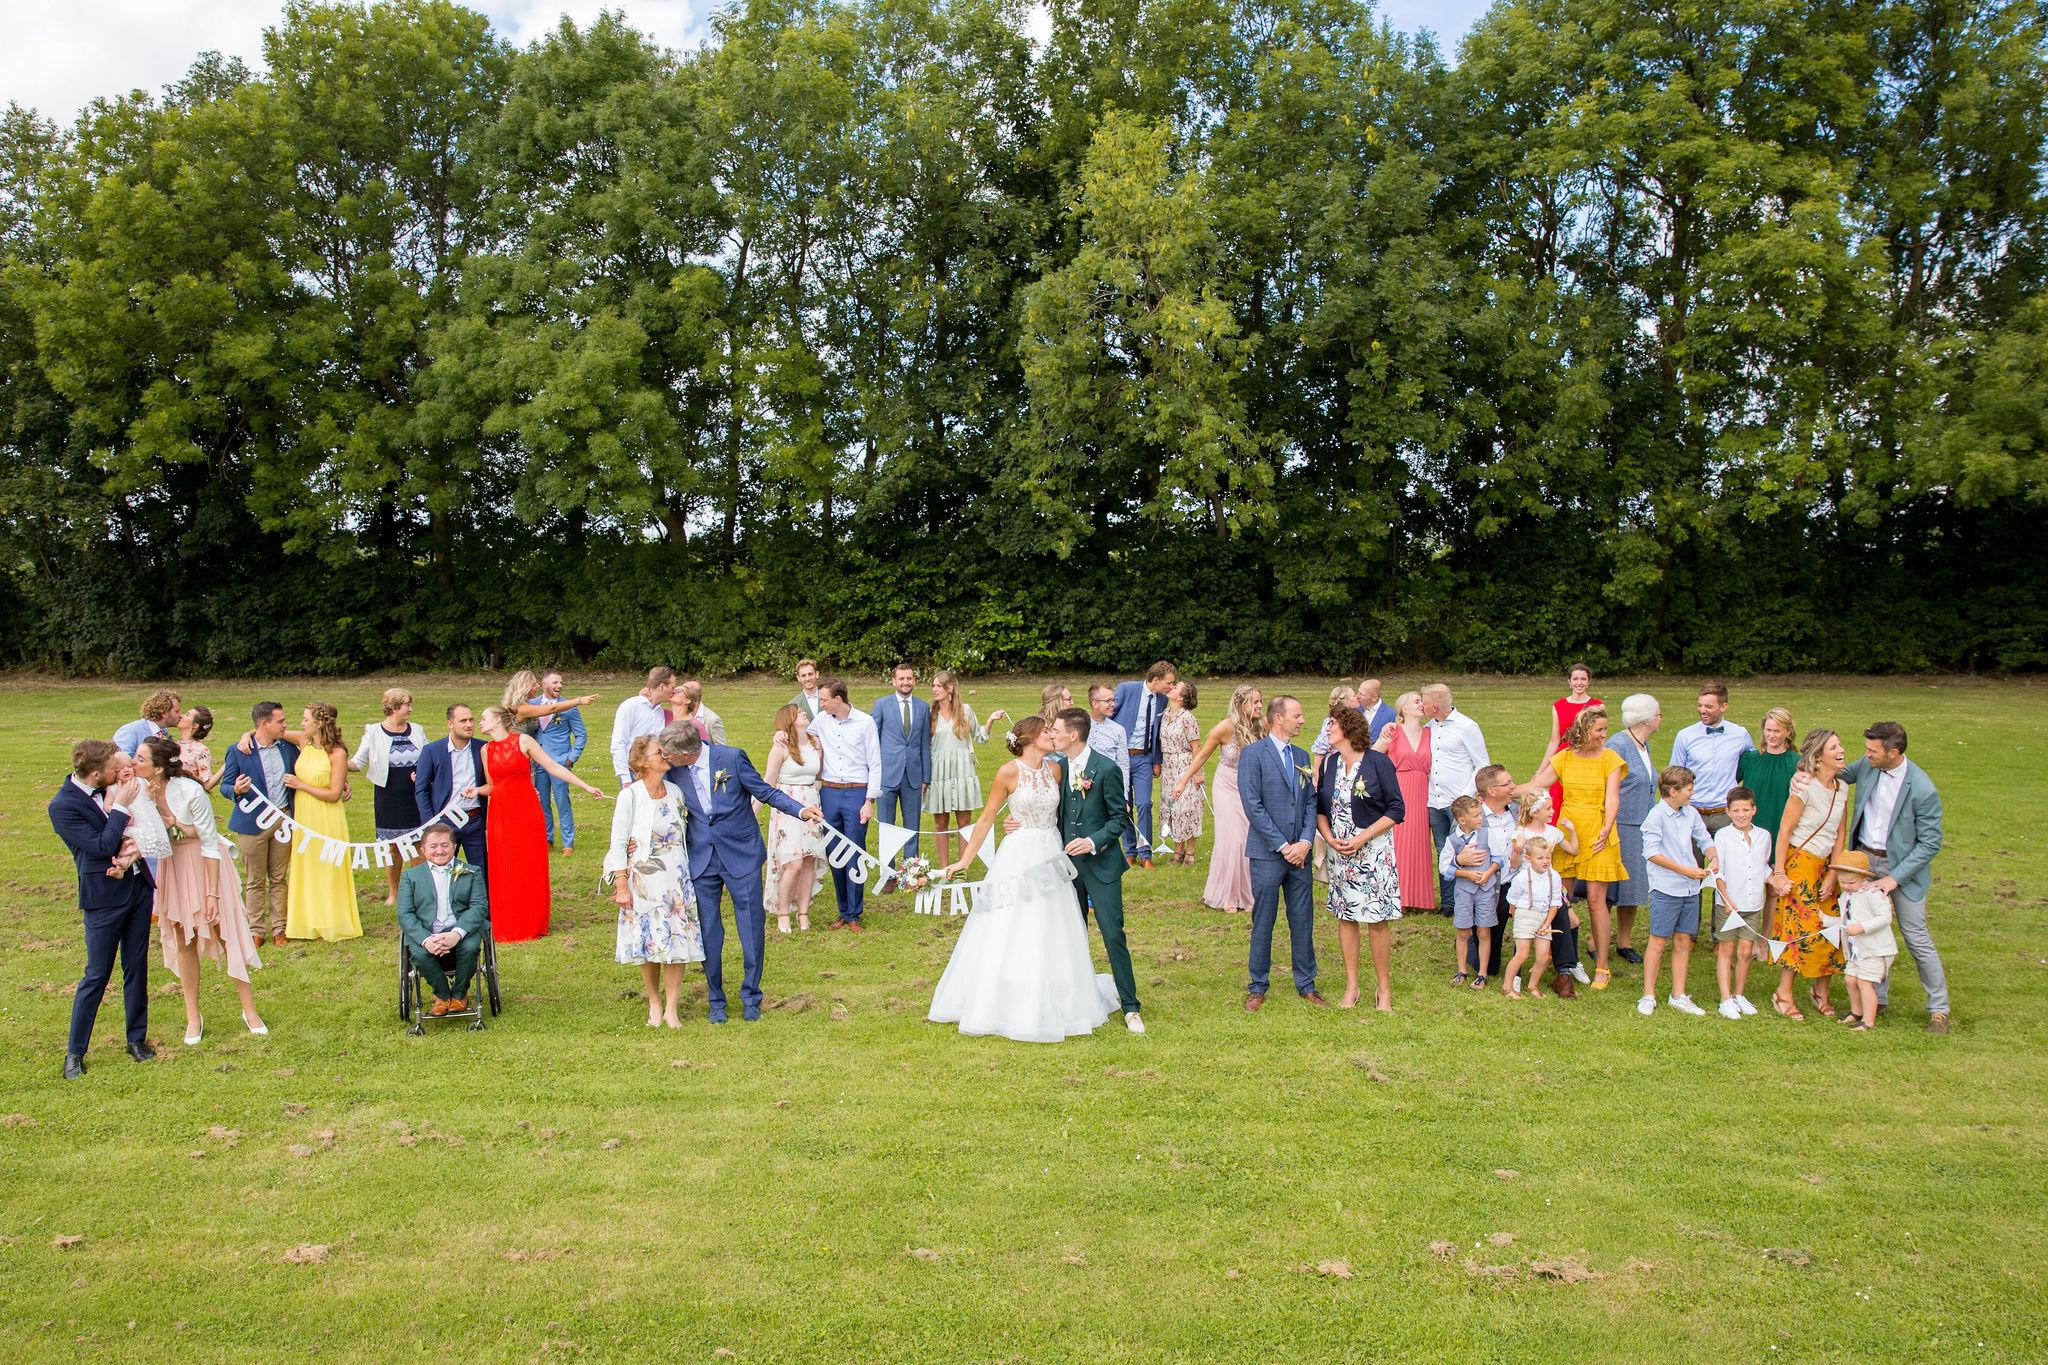 Bruidsfotografie Landgoed de Olmenhorst